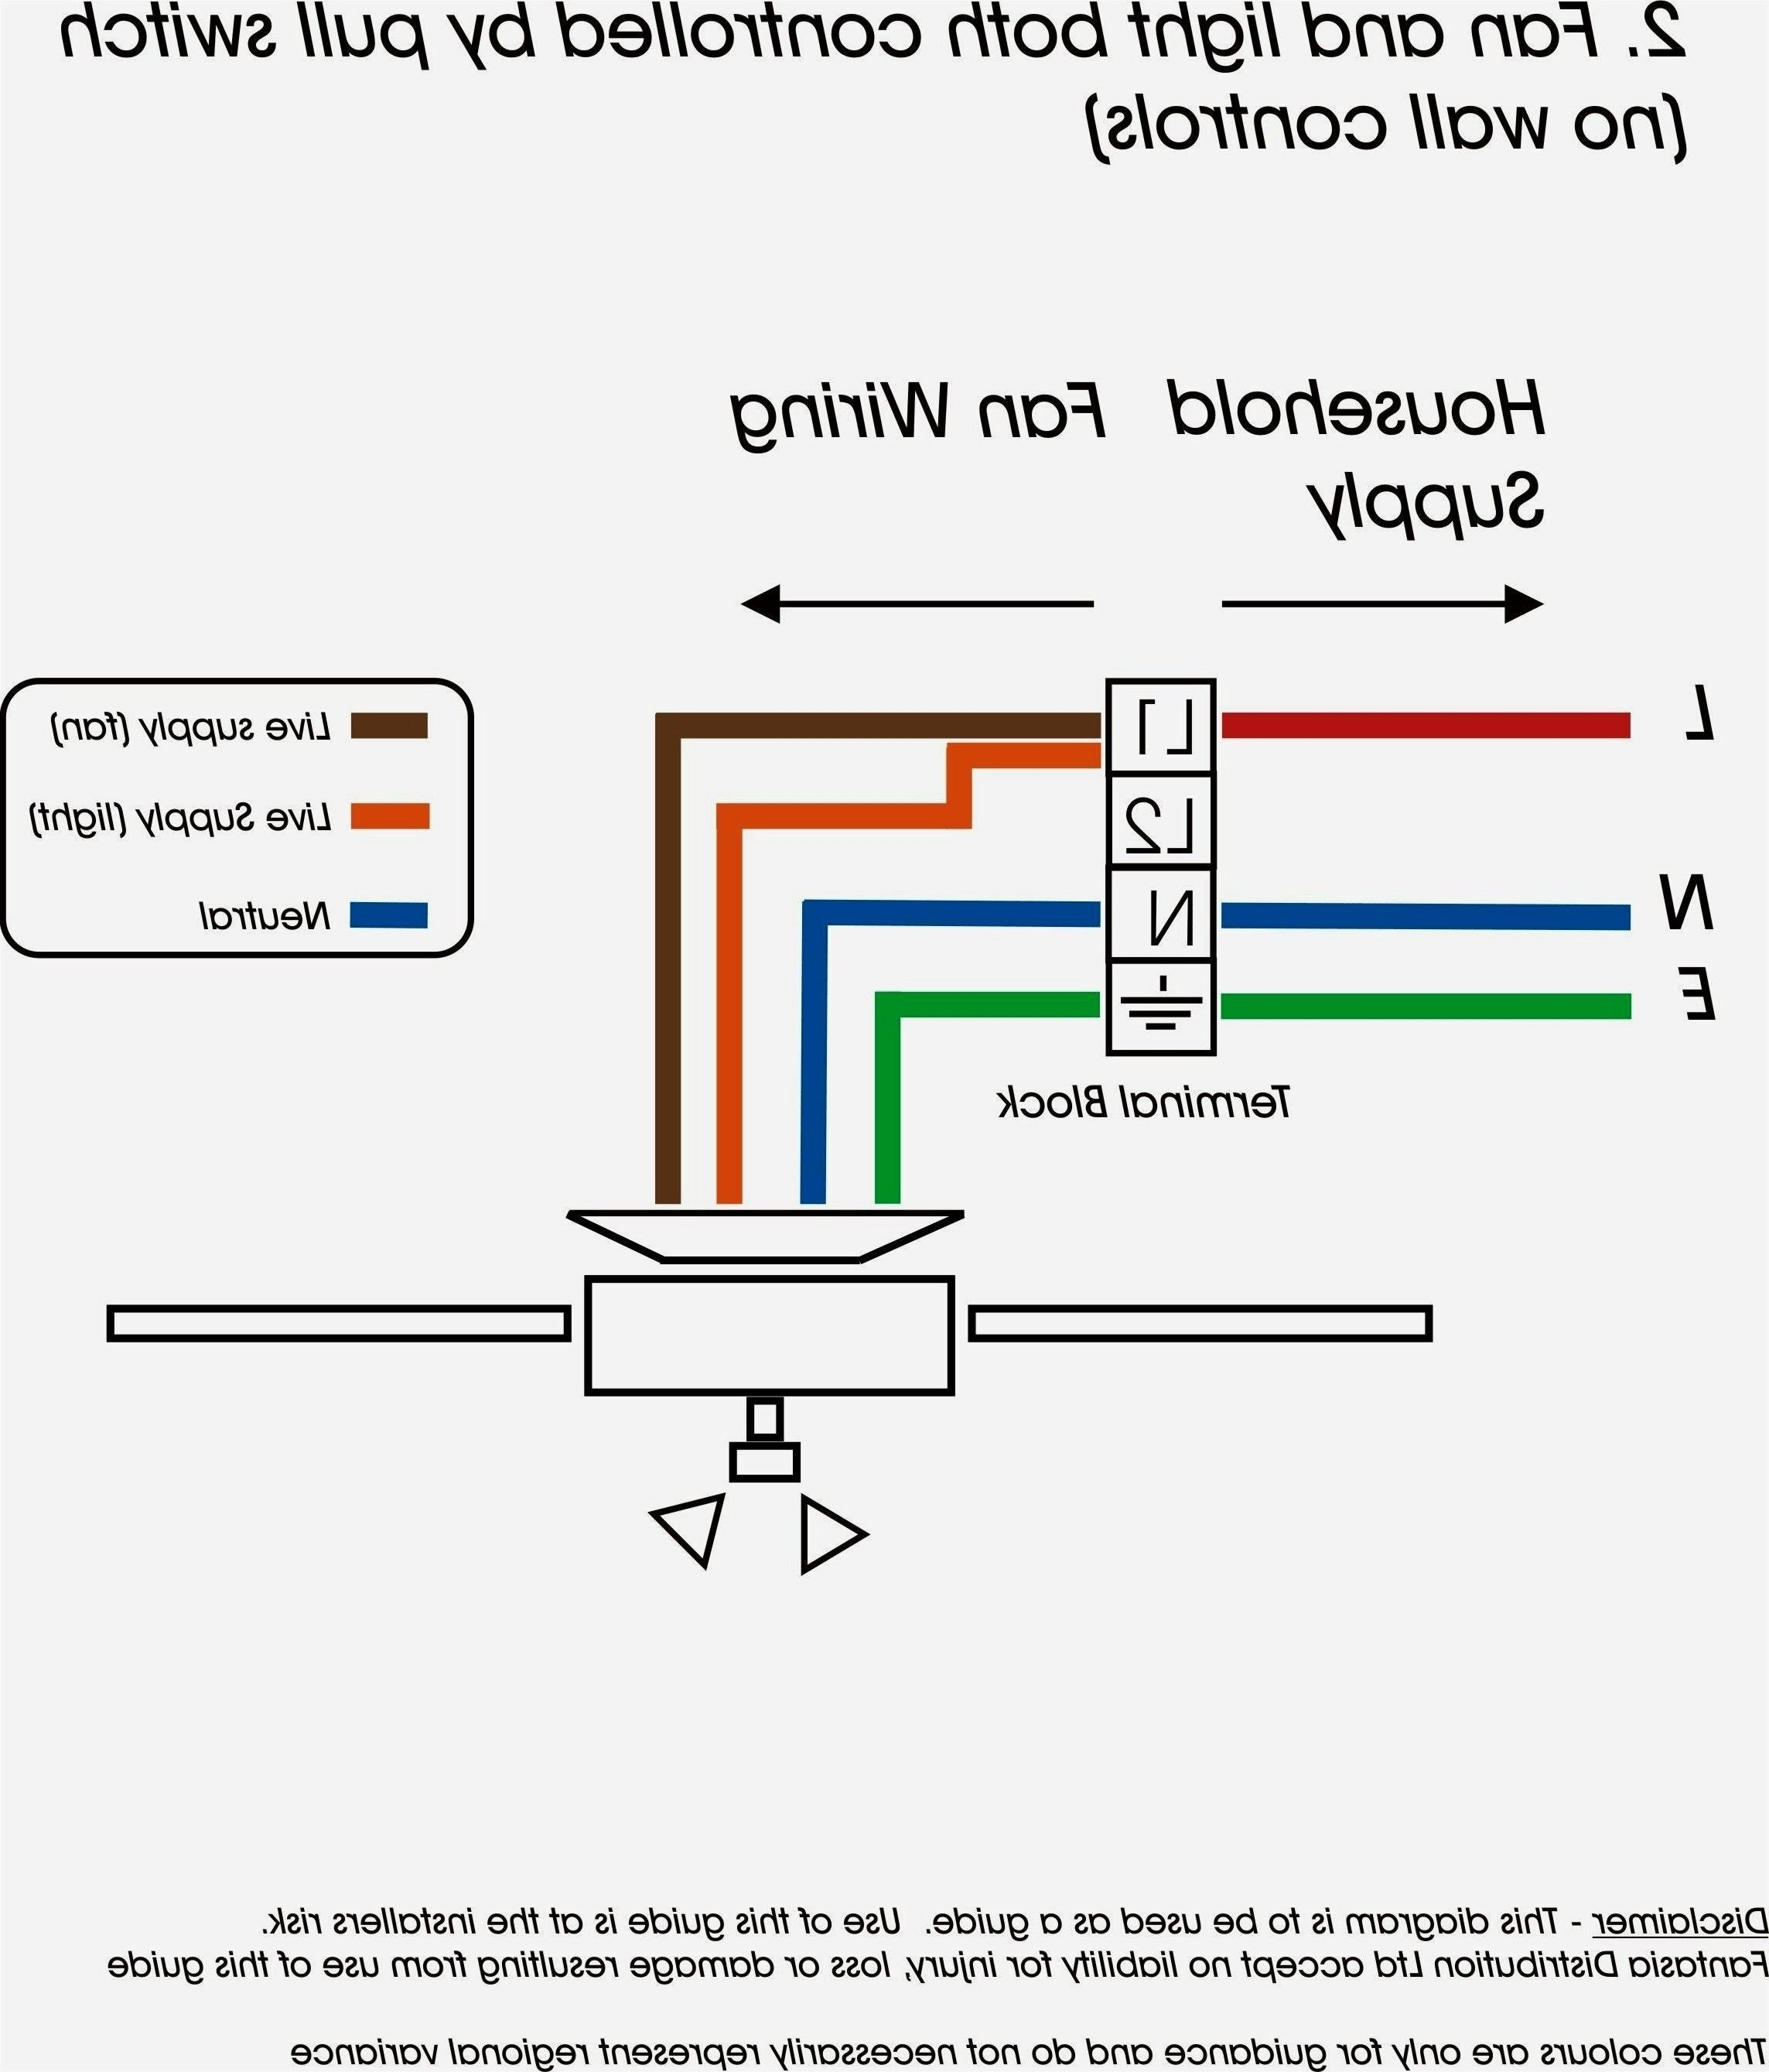 honeywell wiring diagram app inspirationa wiring diagrams honeywell rh ipphil Honeywell Gas Valve Wiring Diagram